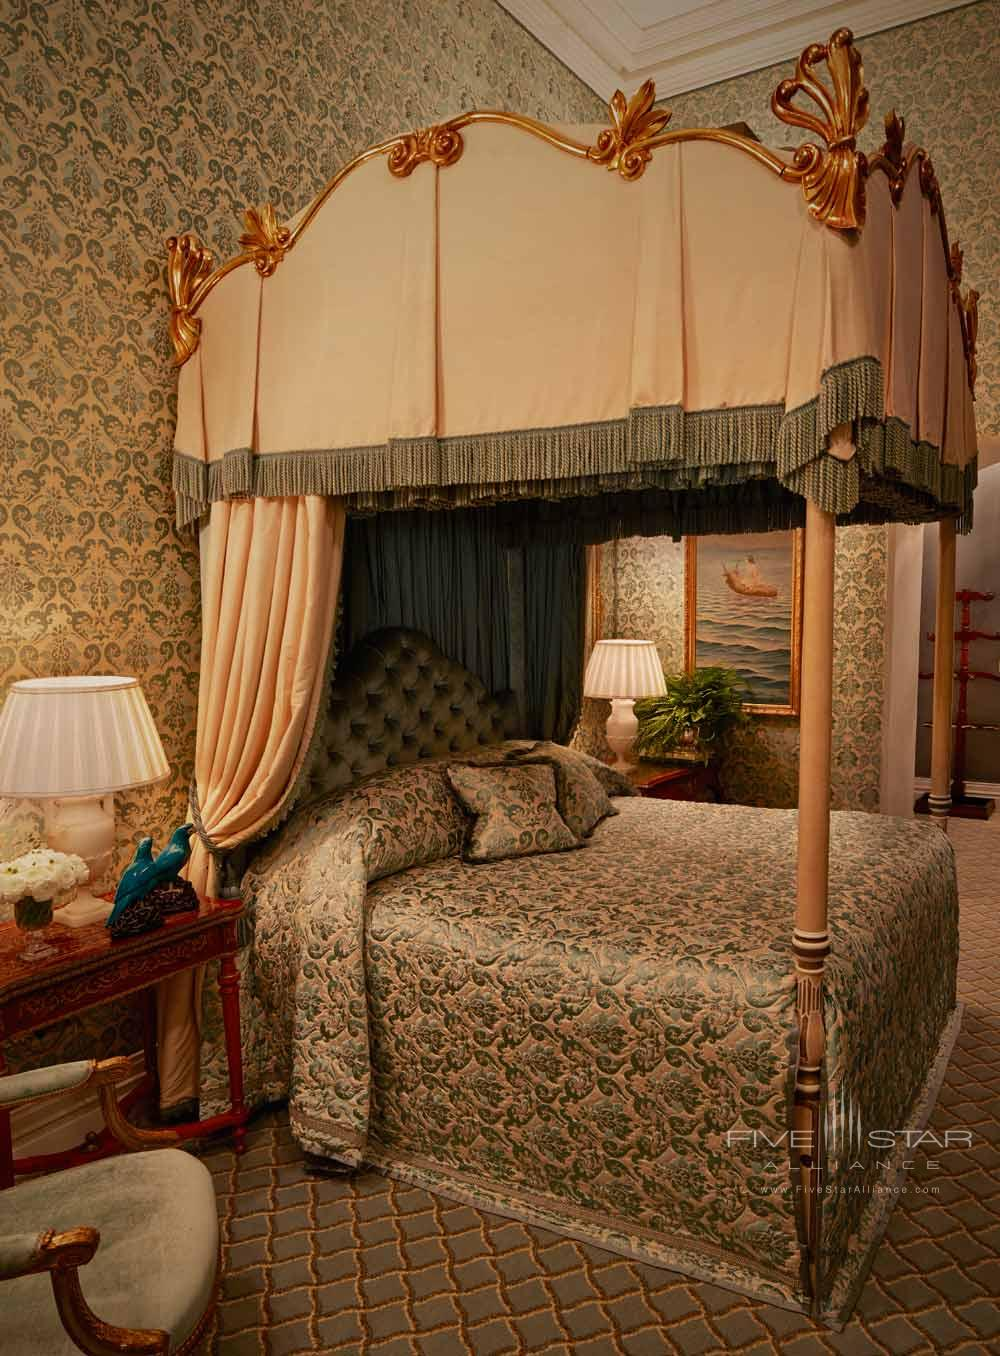 Corrib Lake View Room at Ashford Castle County Mayo, Ireland